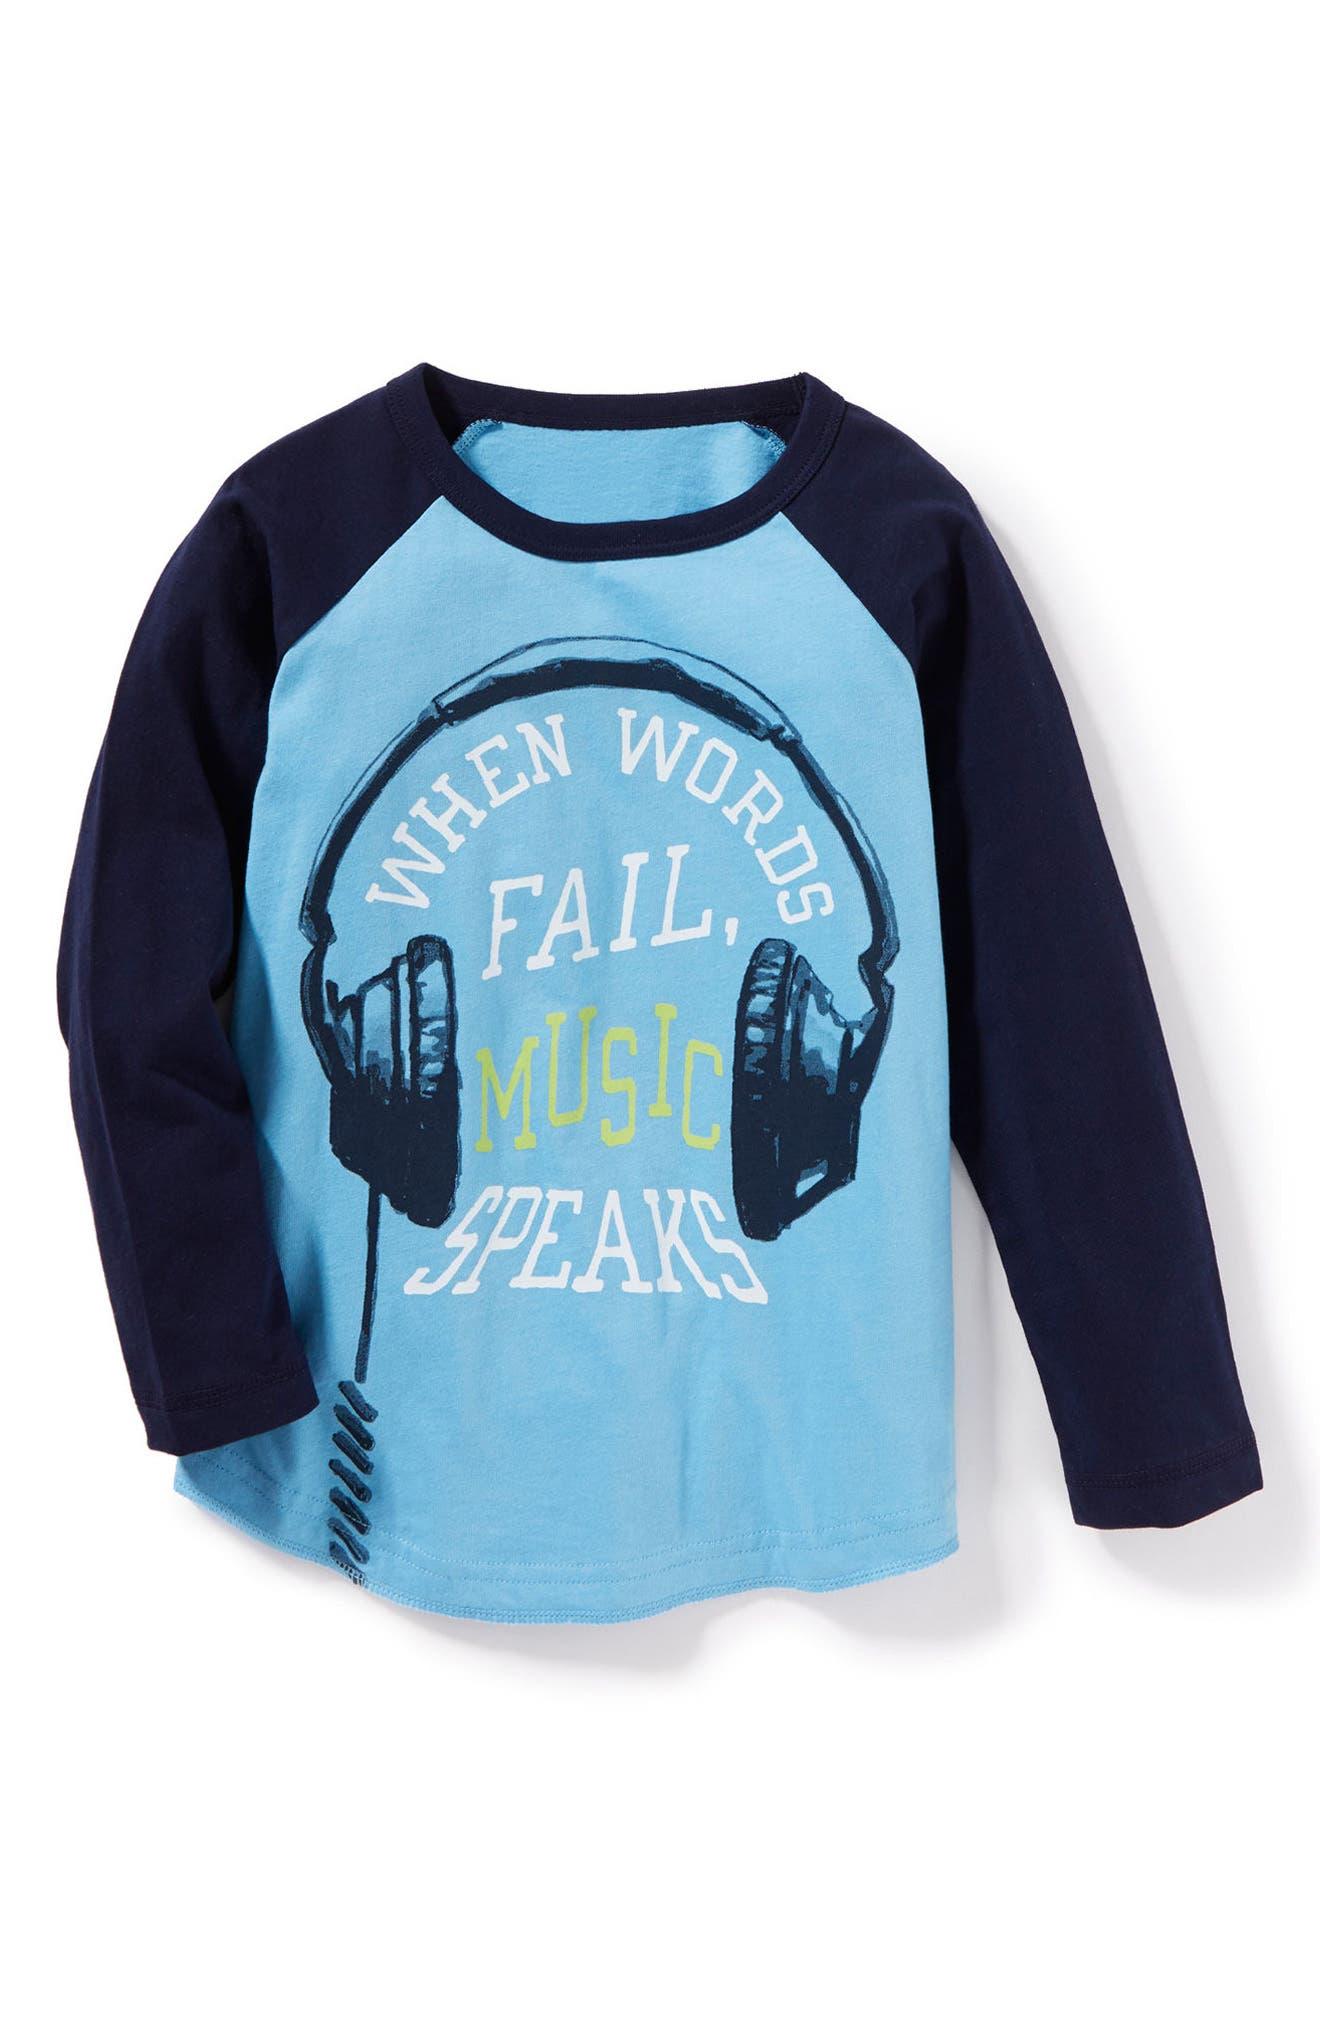 Main Image - Peek Music Speaks Graphic Long Sleeve T-Shirt (Toddler Boys, Little Boys & Big Boys)